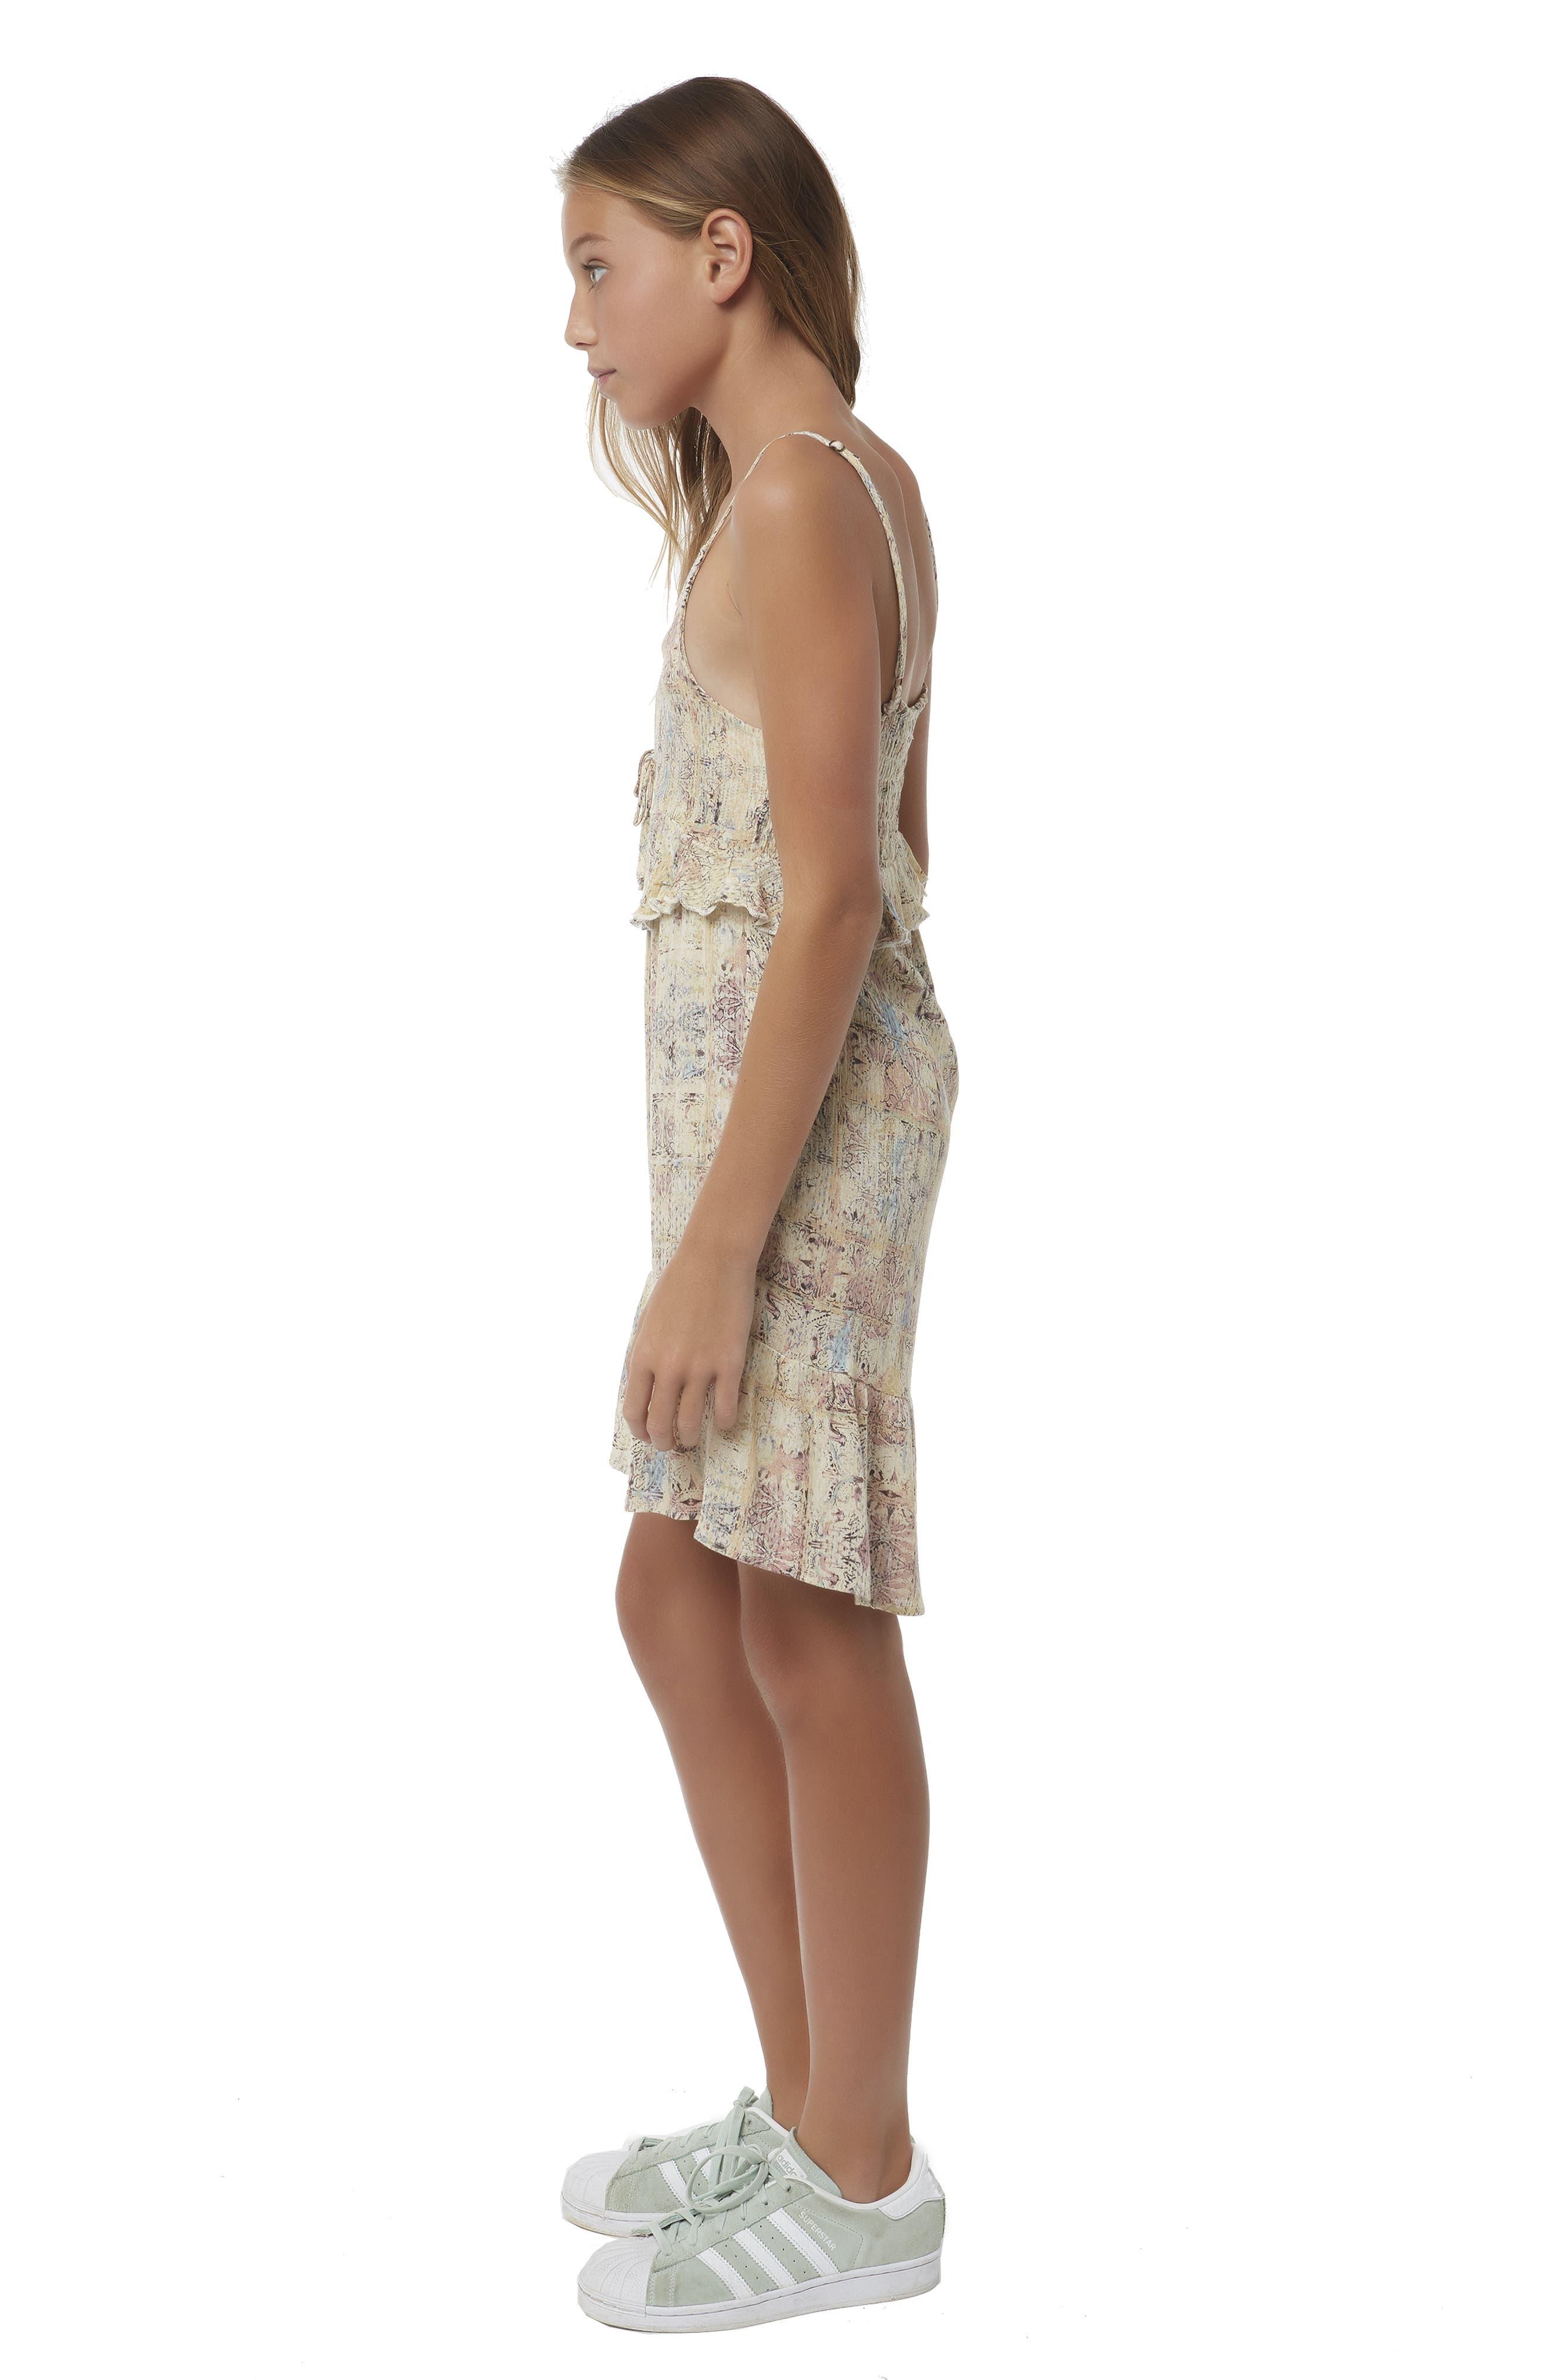 O'NEILL, Lithia Peplum High/Low Dress, Alternate thumbnail 6, color, 994